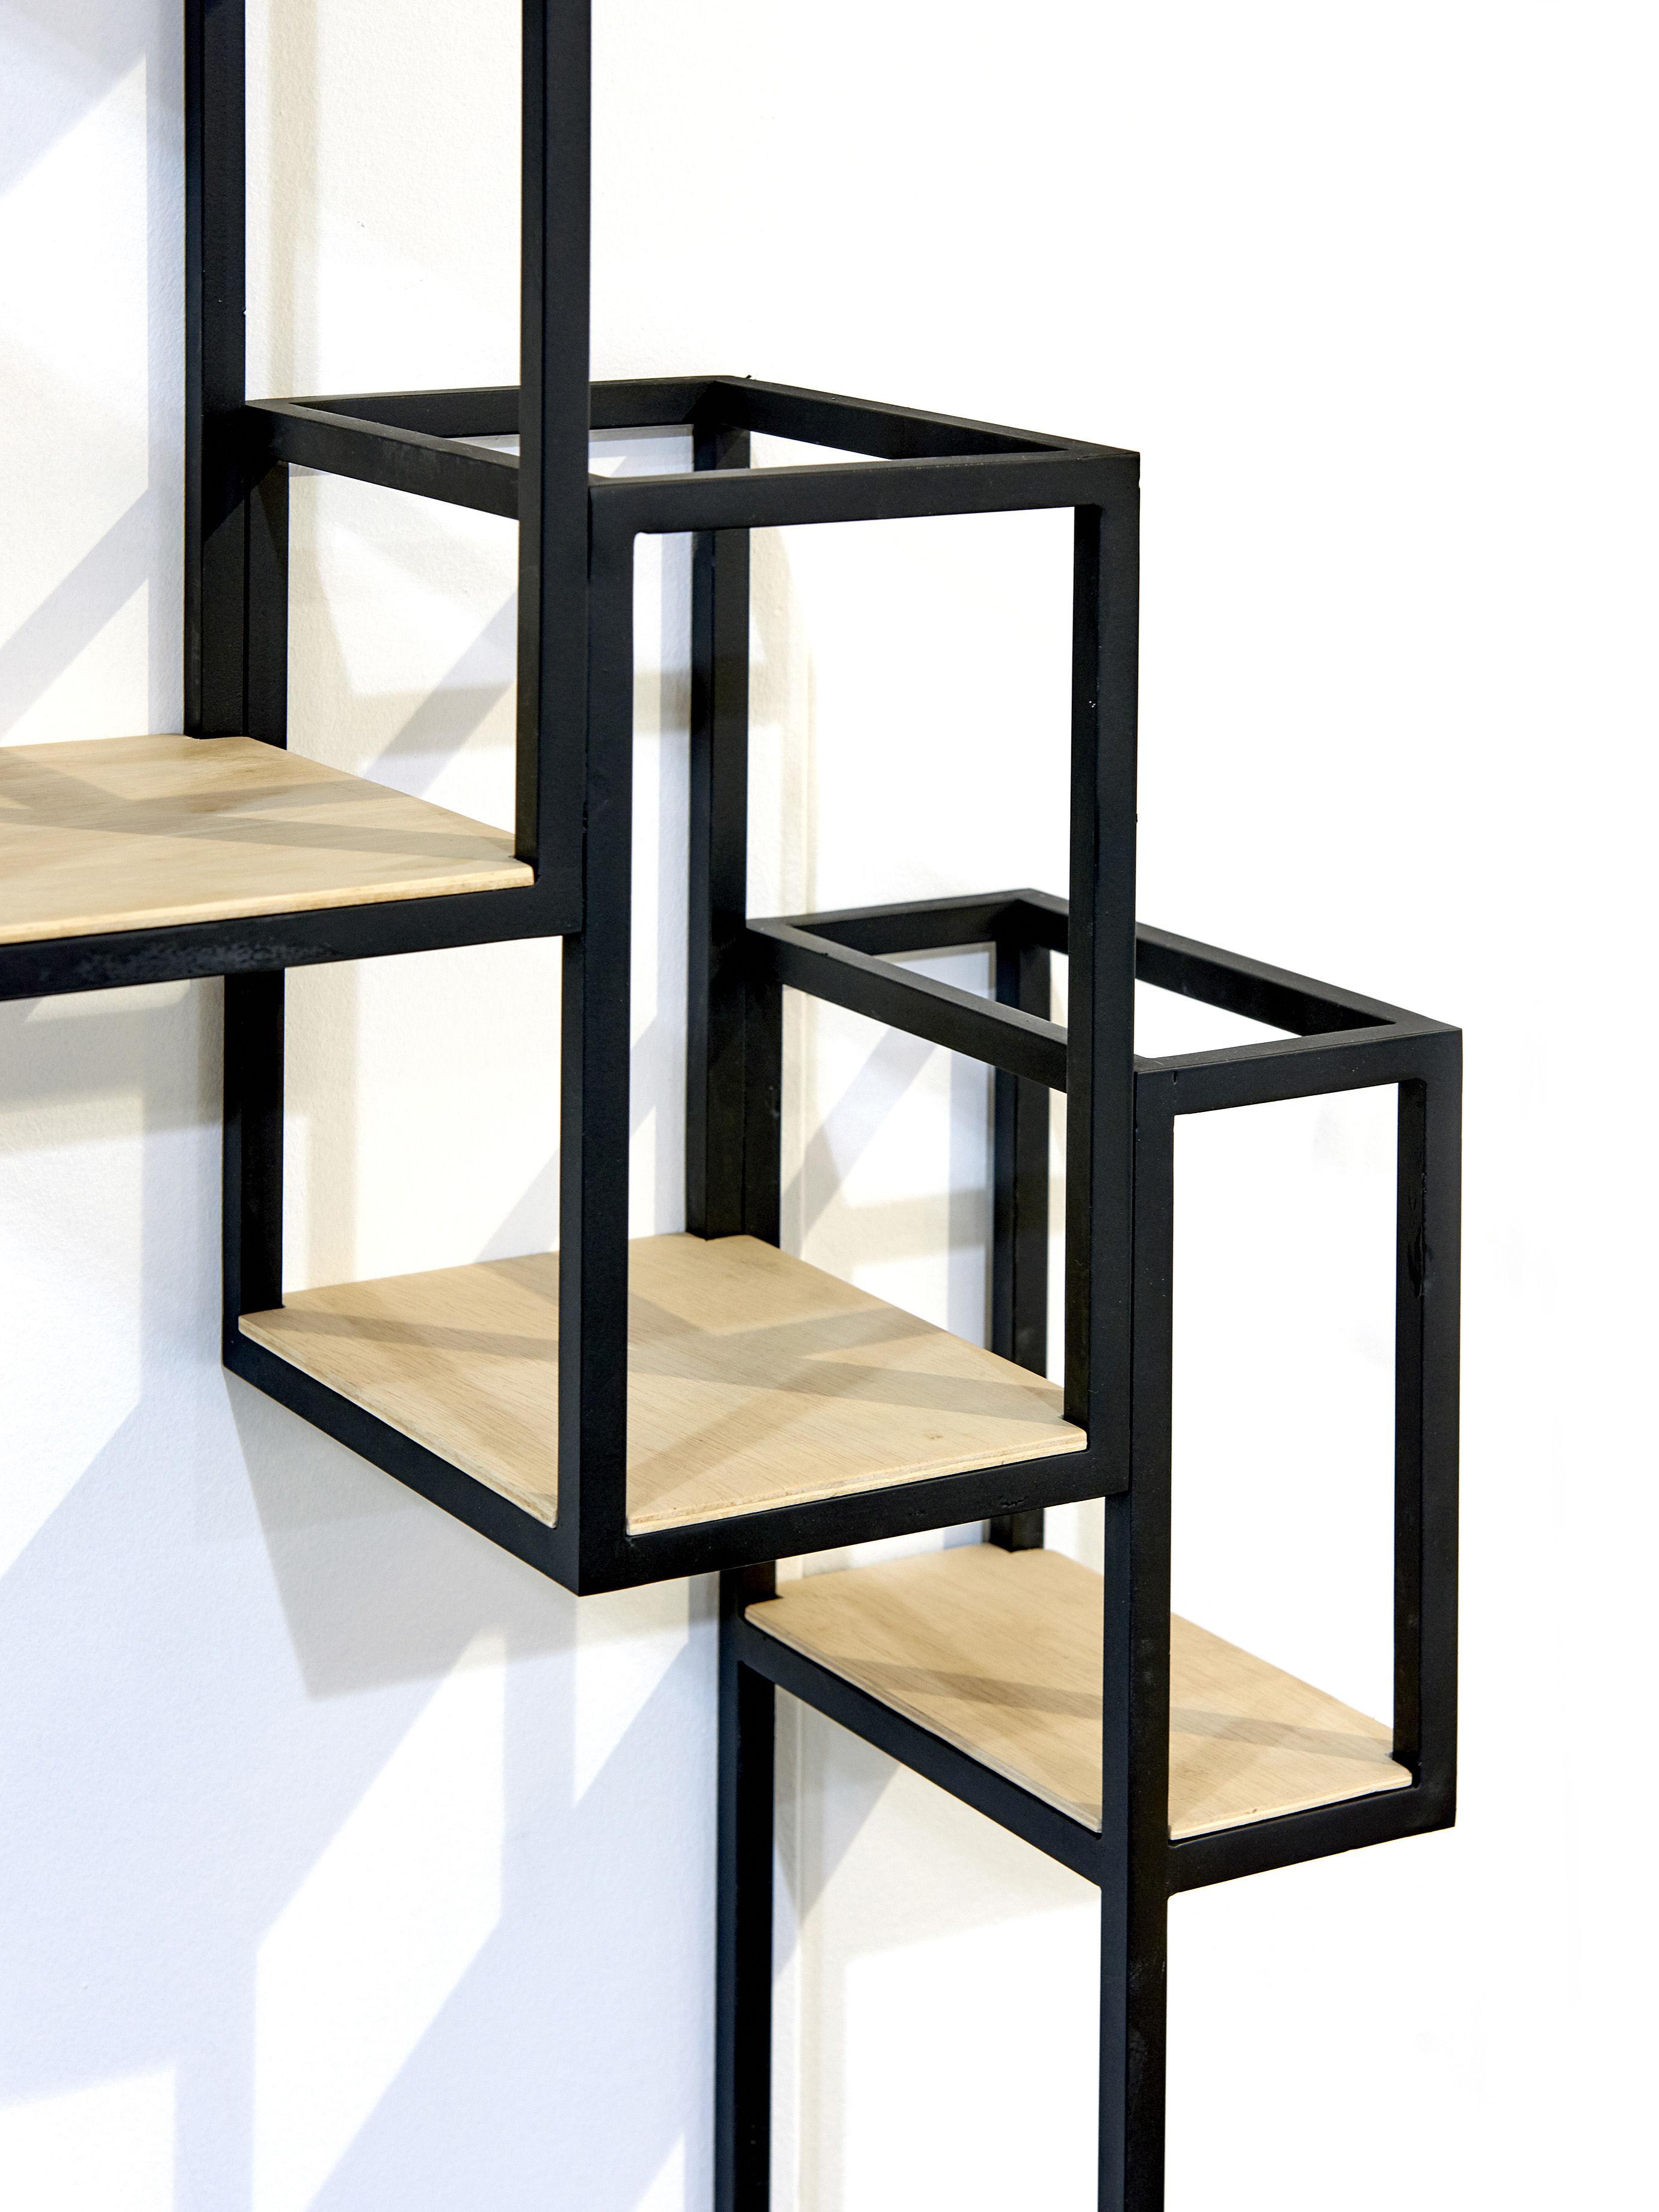 biblioth que jointed murale 152 x 115 cm noir bois serax. Black Bedroom Furniture Sets. Home Design Ideas